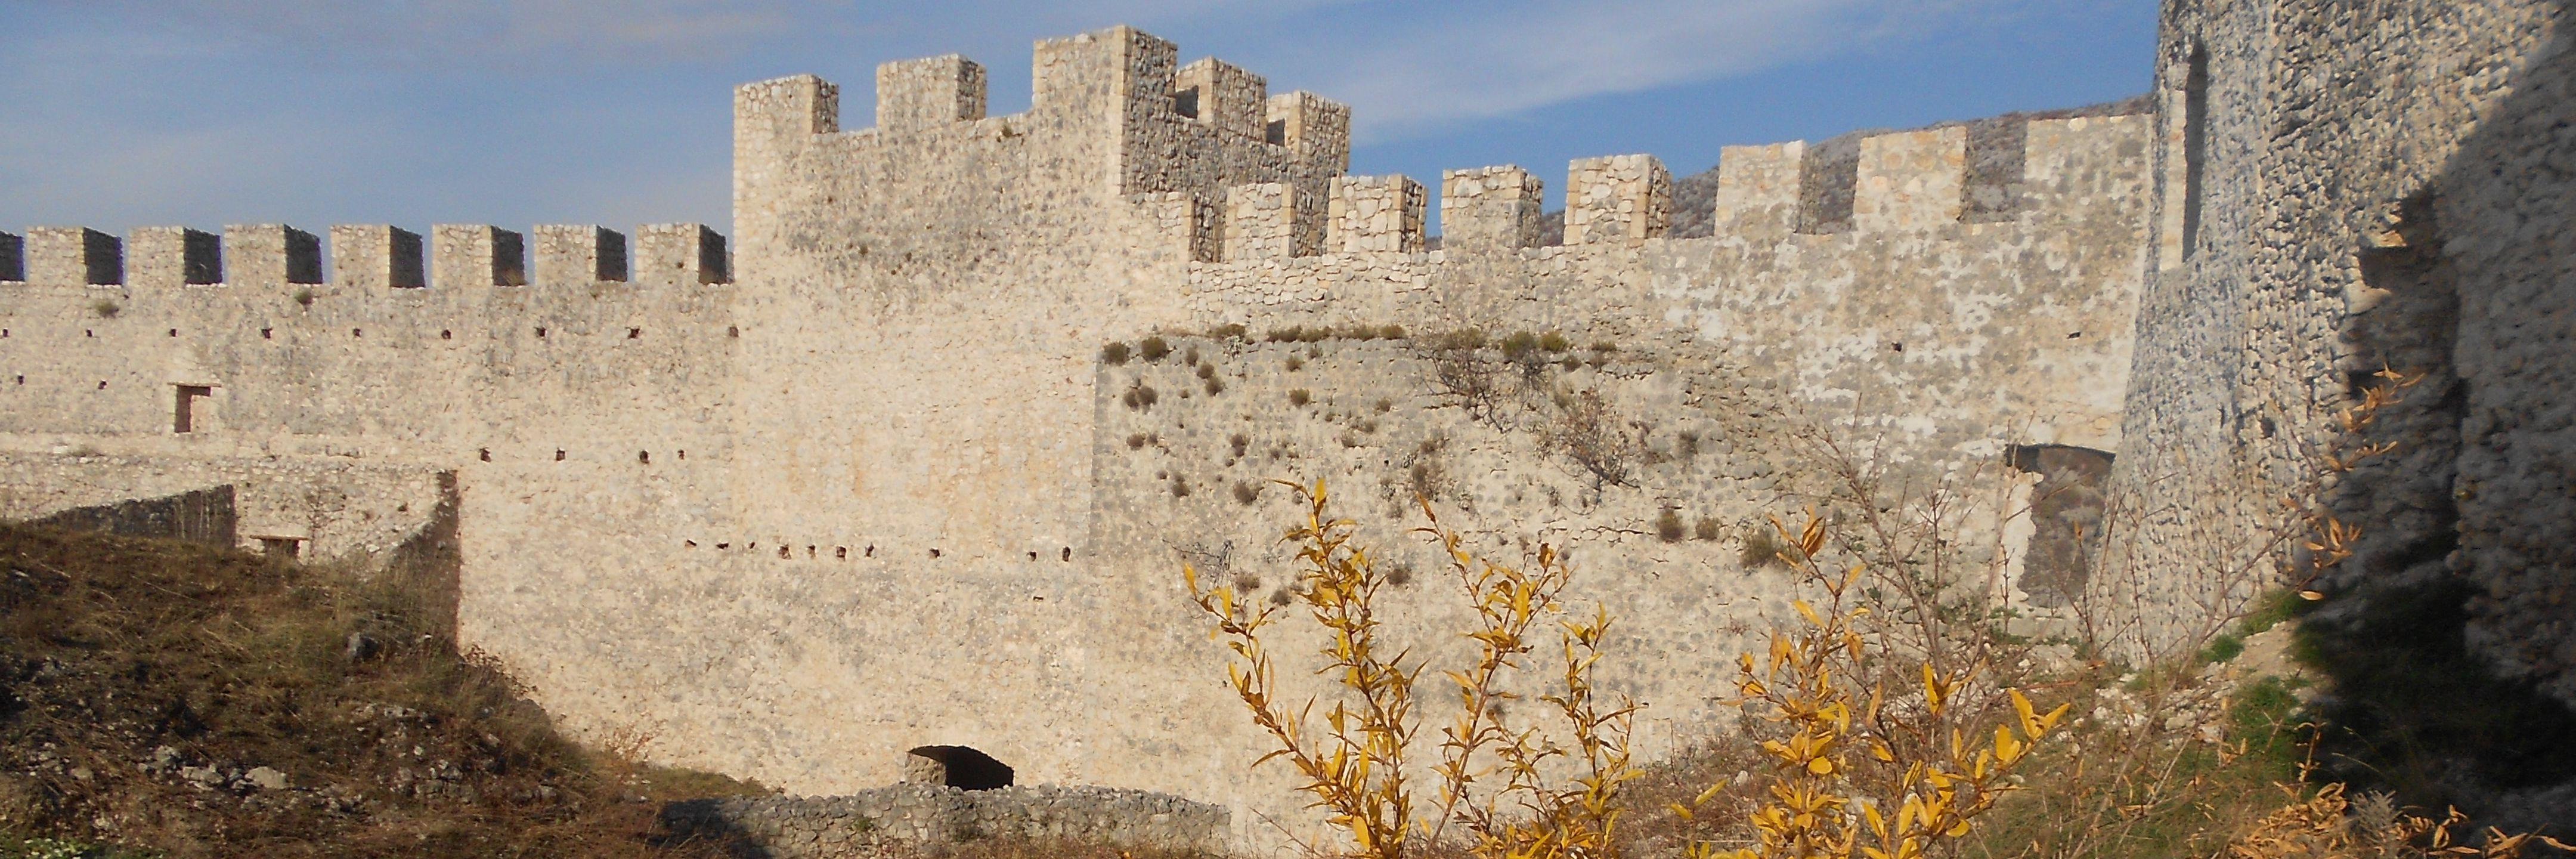 Крепости Боснии и Герцеговины